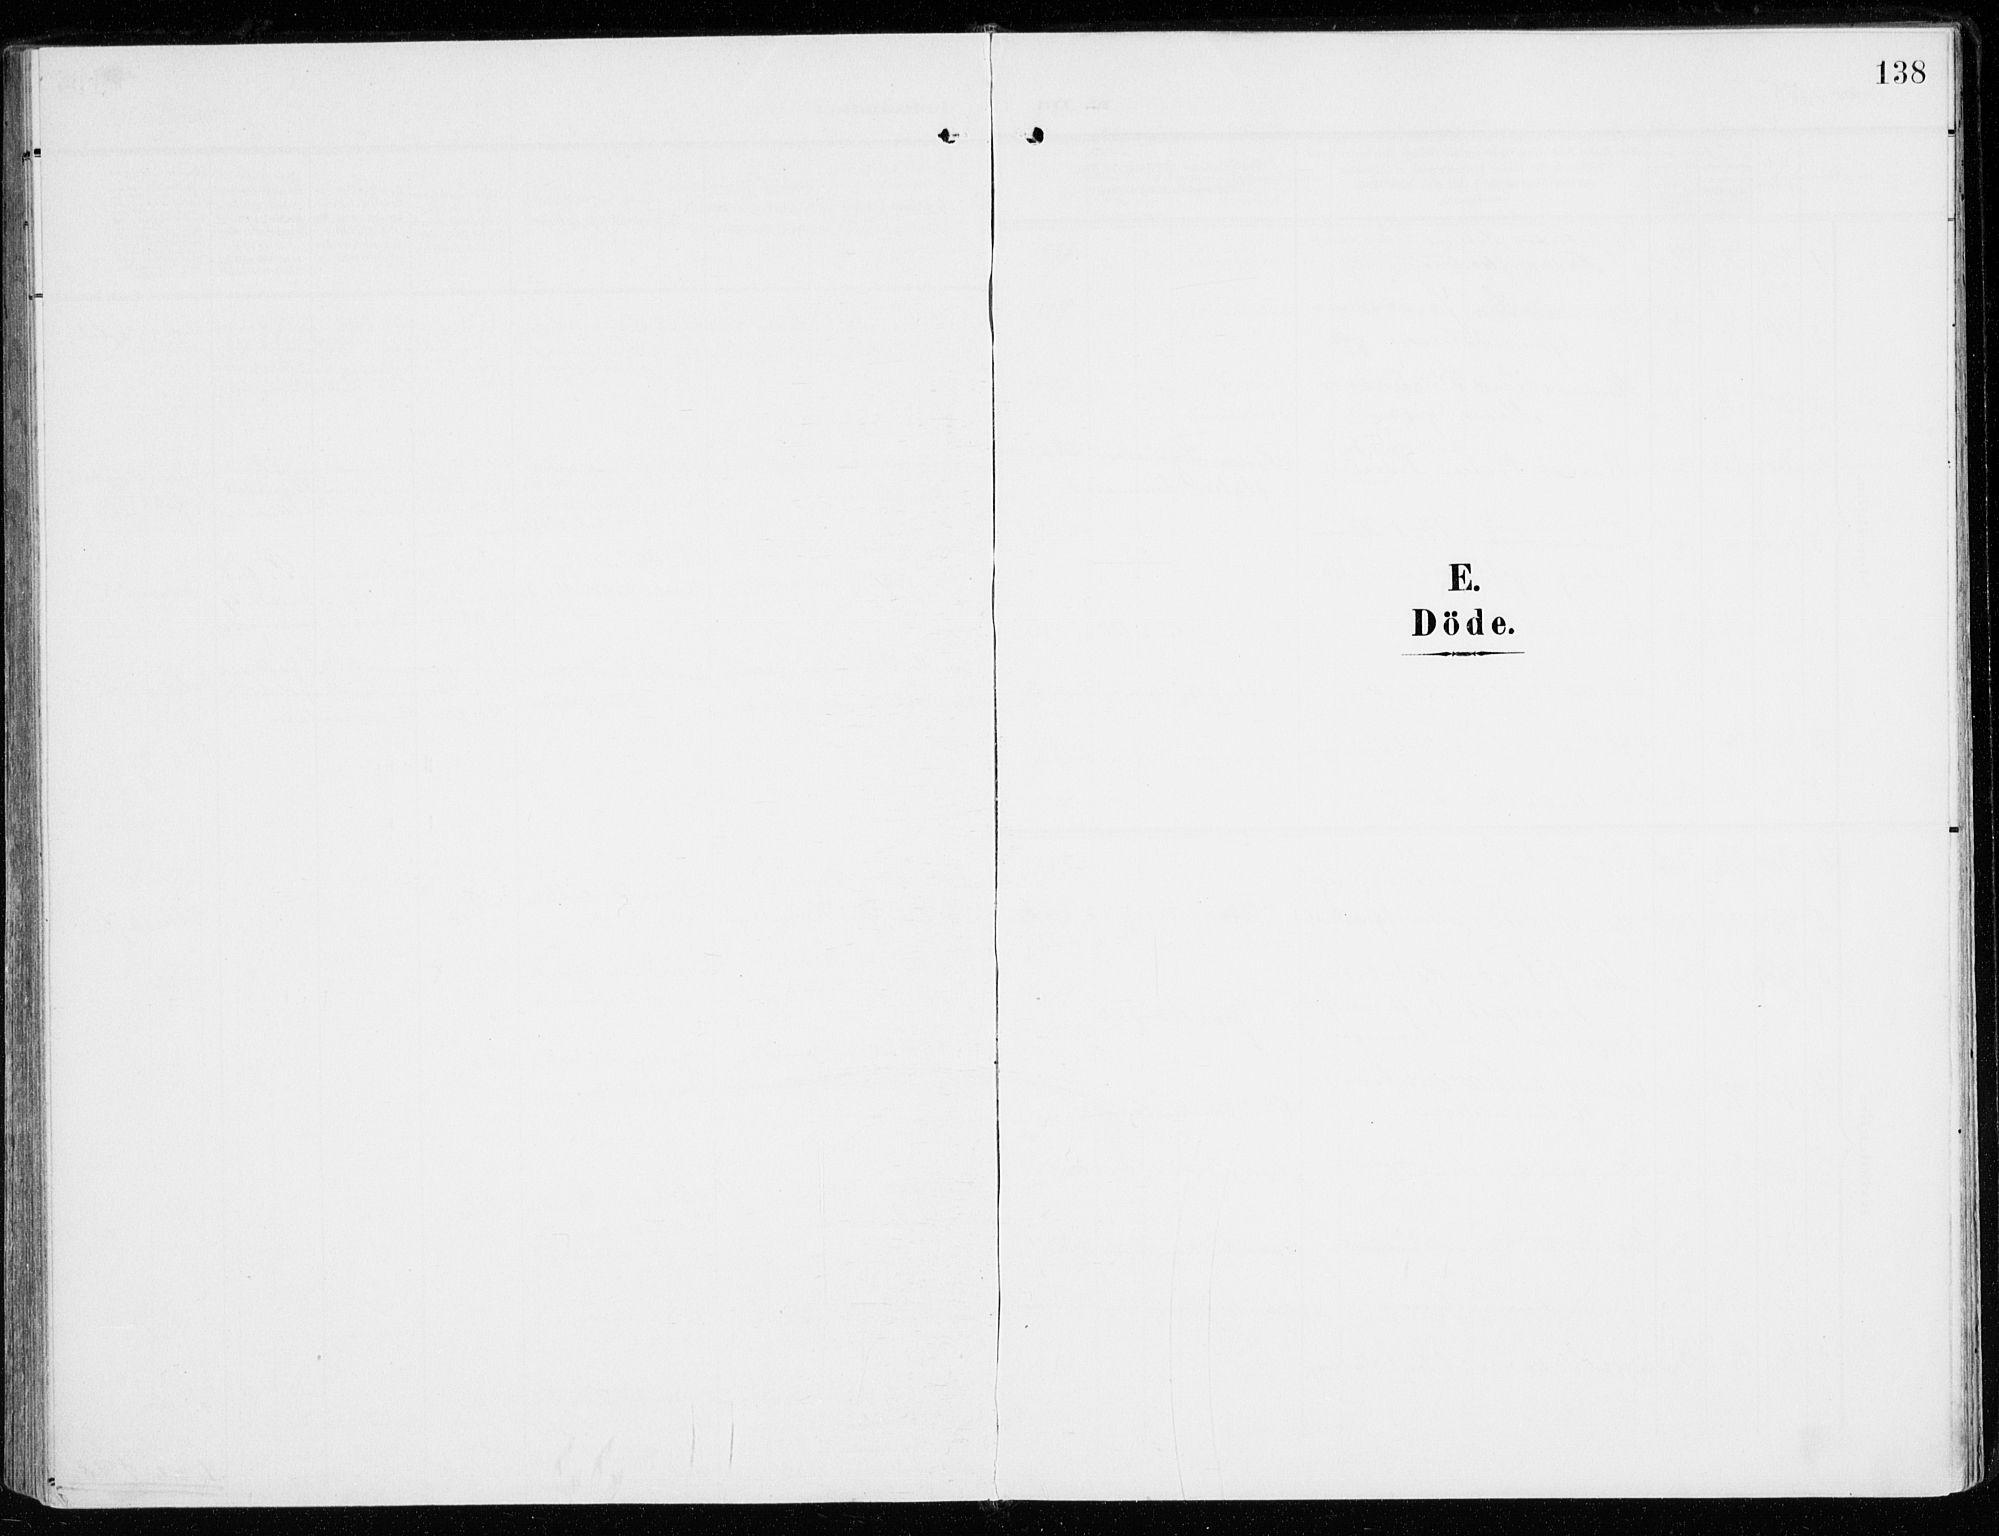 SAH, Sel prestekontor, Ministerialbok nr. 2, 1905-1919, s. 138